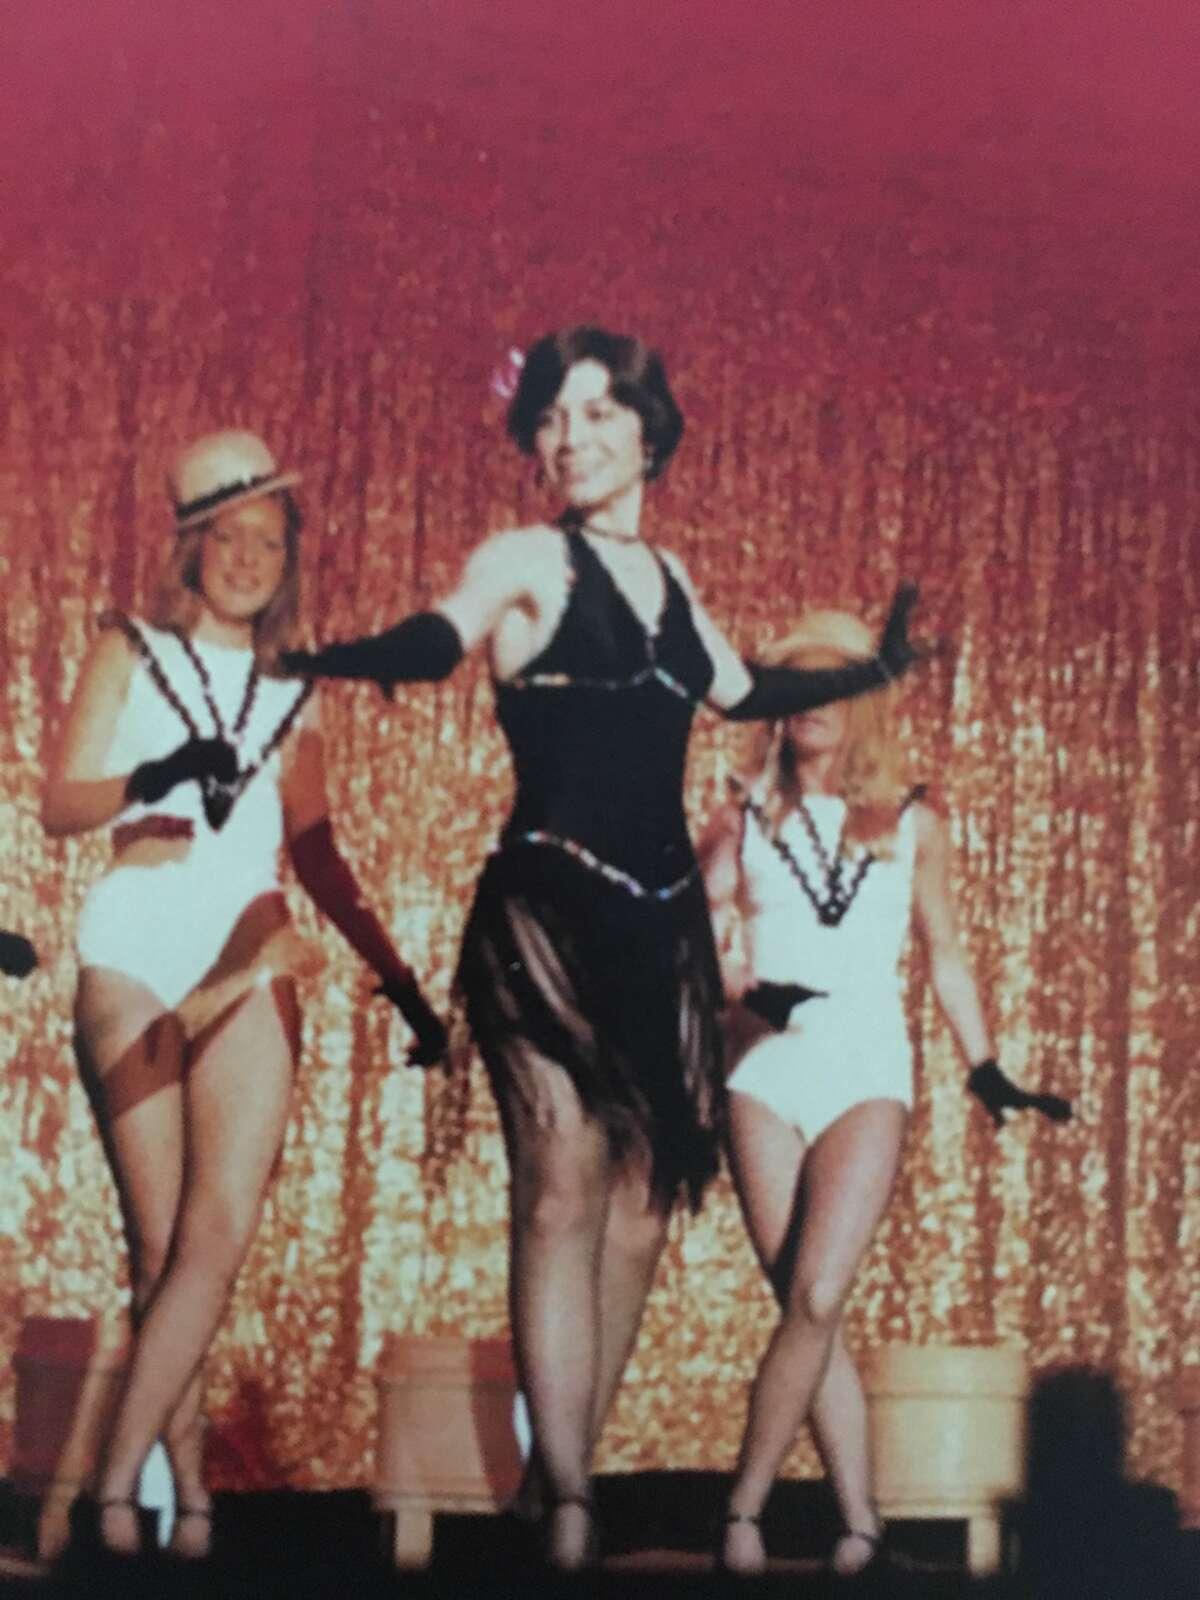 Mrs.-Nancy-dancing-at-her-rectial-2-Kicks-archives